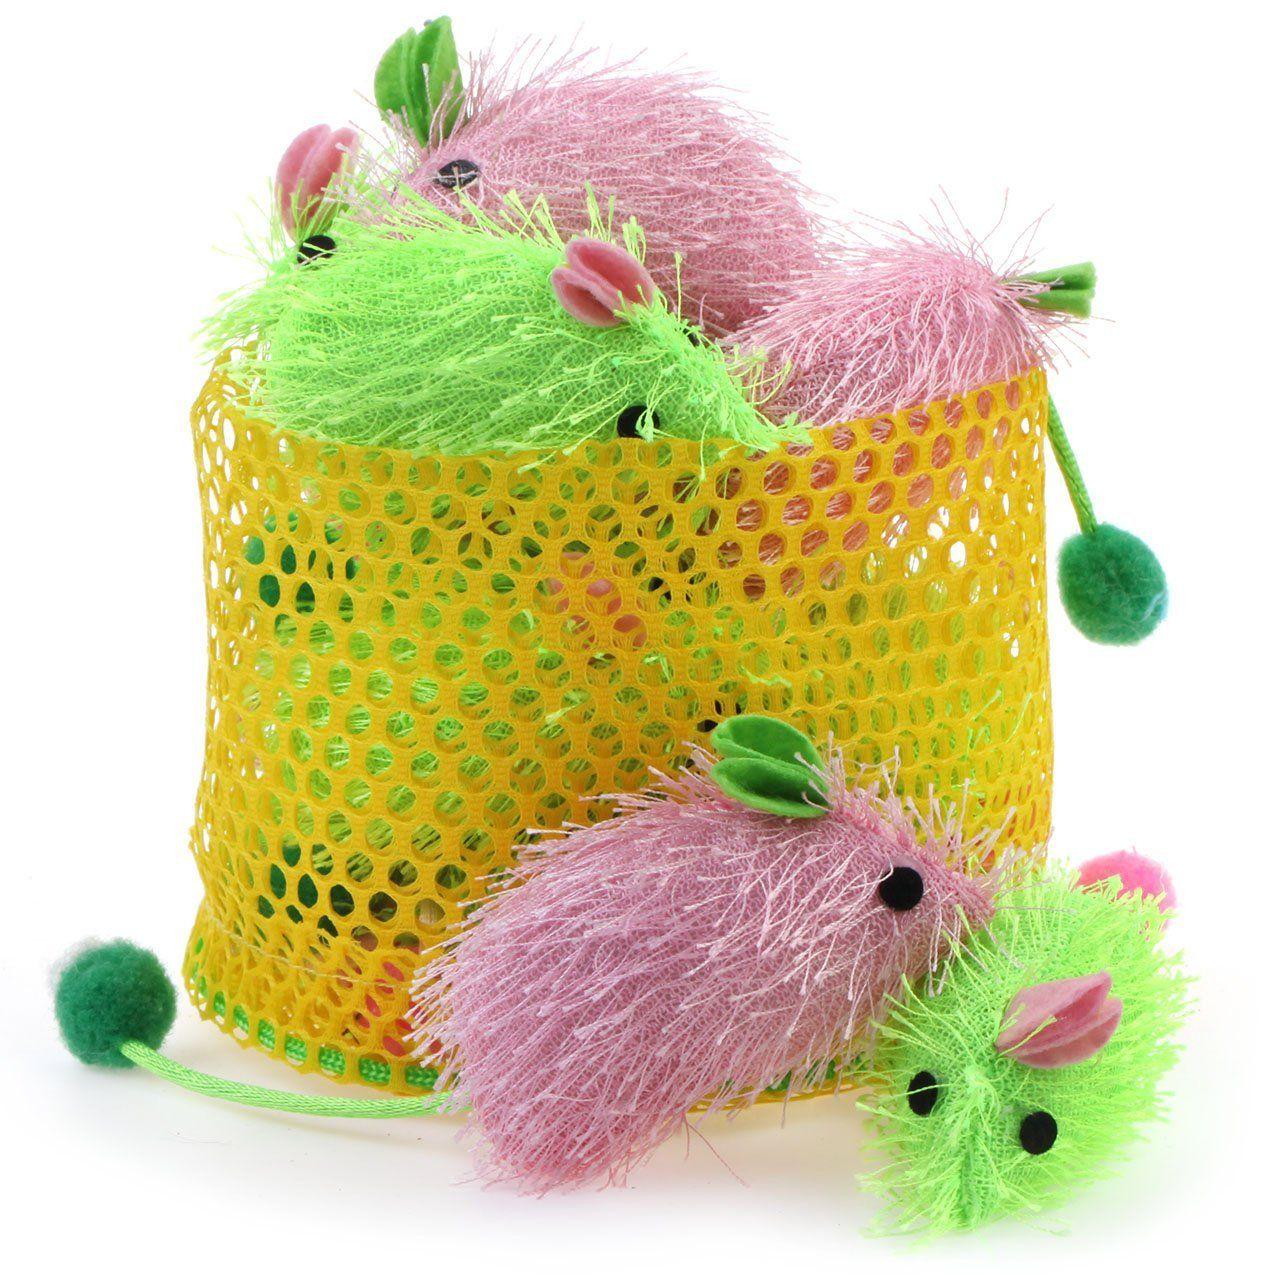 Chiwava 2.7'' Cat Toy Catnip Mice Soft Plush Bright Color